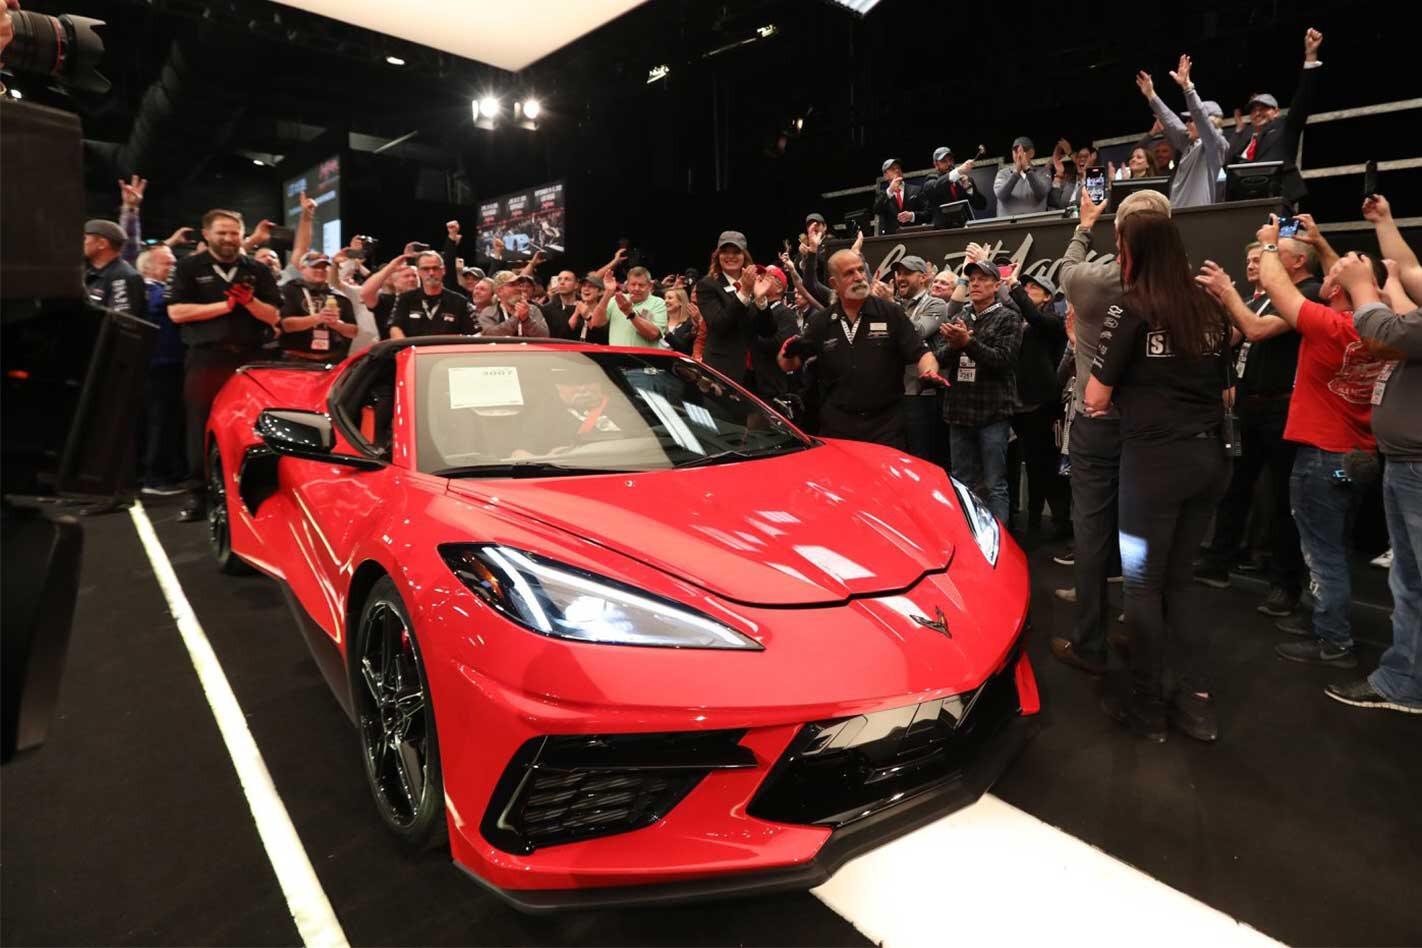 First Chevrolet C8 Corvette Stingray auction